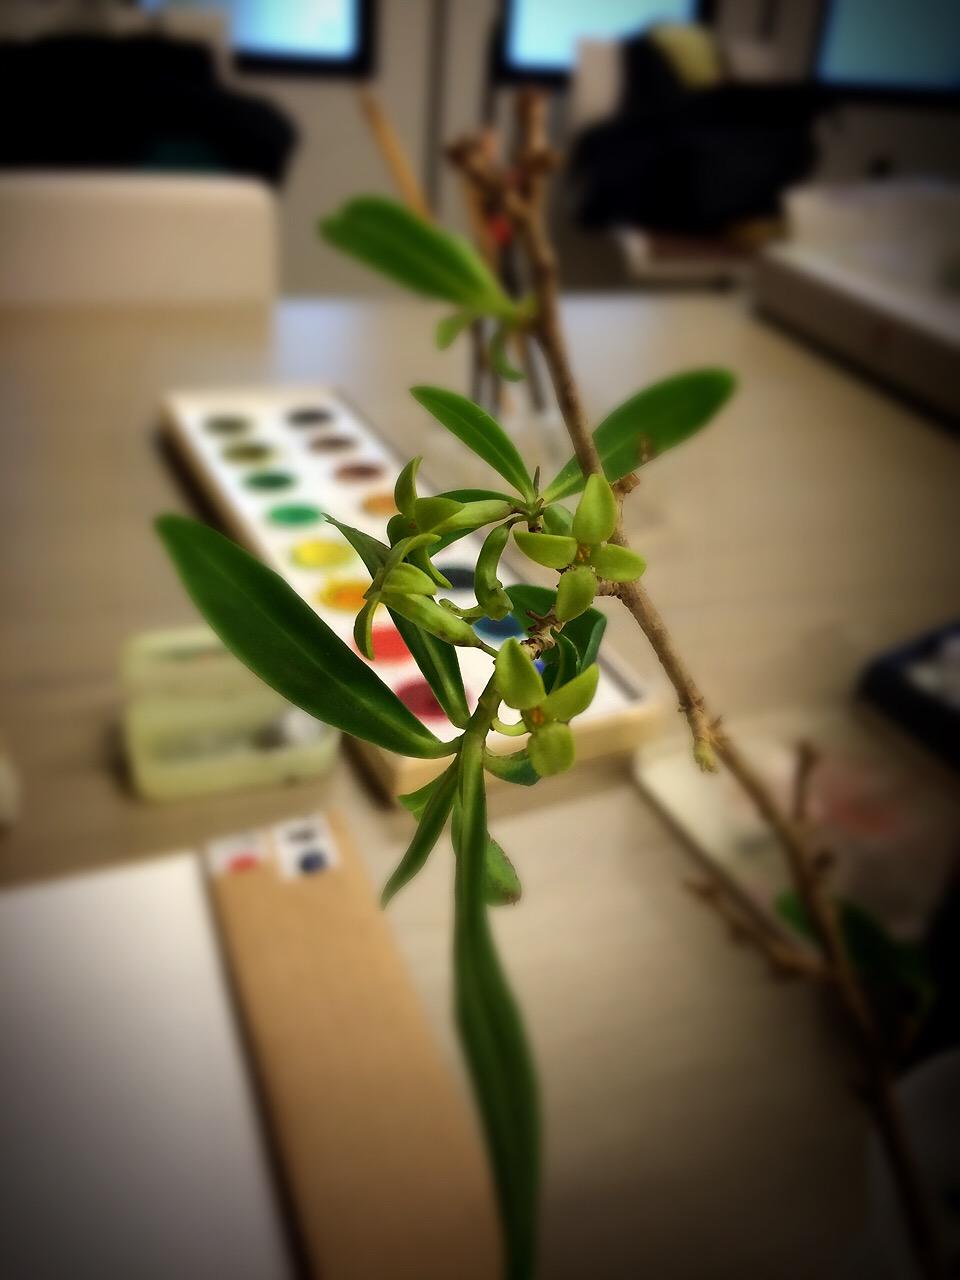 緑色の沈丁花_c0206645_17291864.jpg